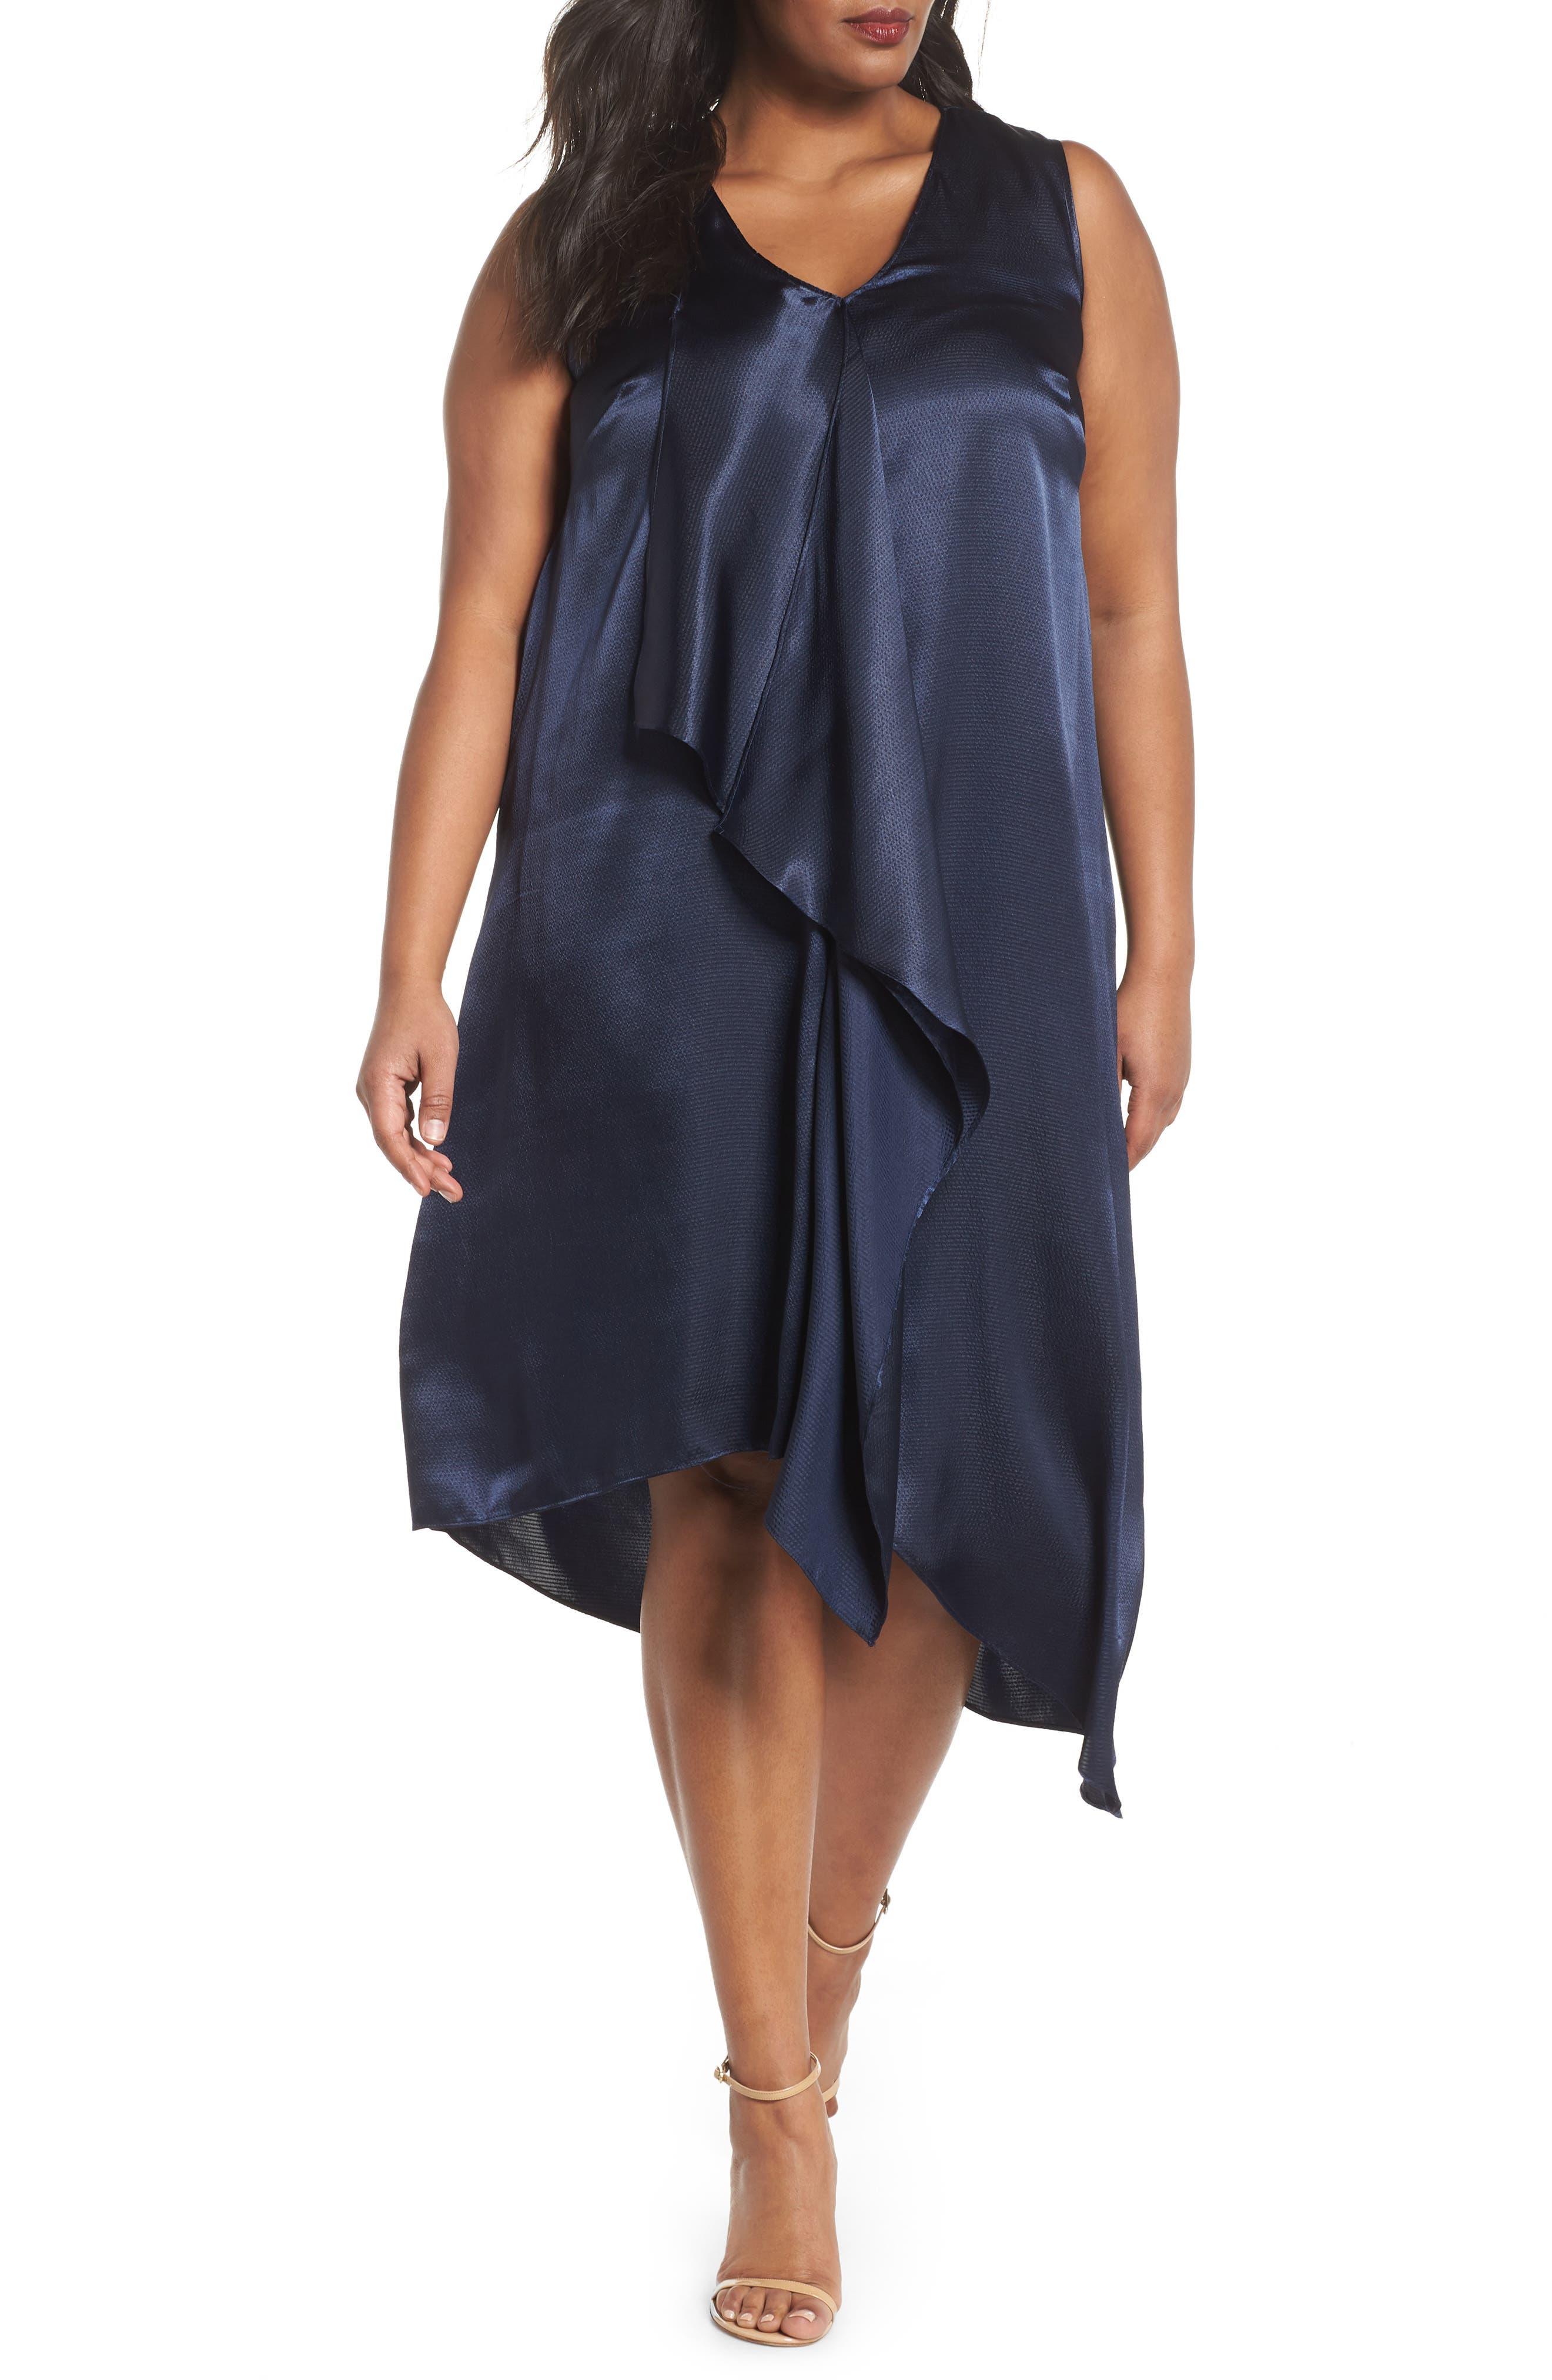 Adrianna Papell Asymmetrical Trapeze Dress (Plus Size)